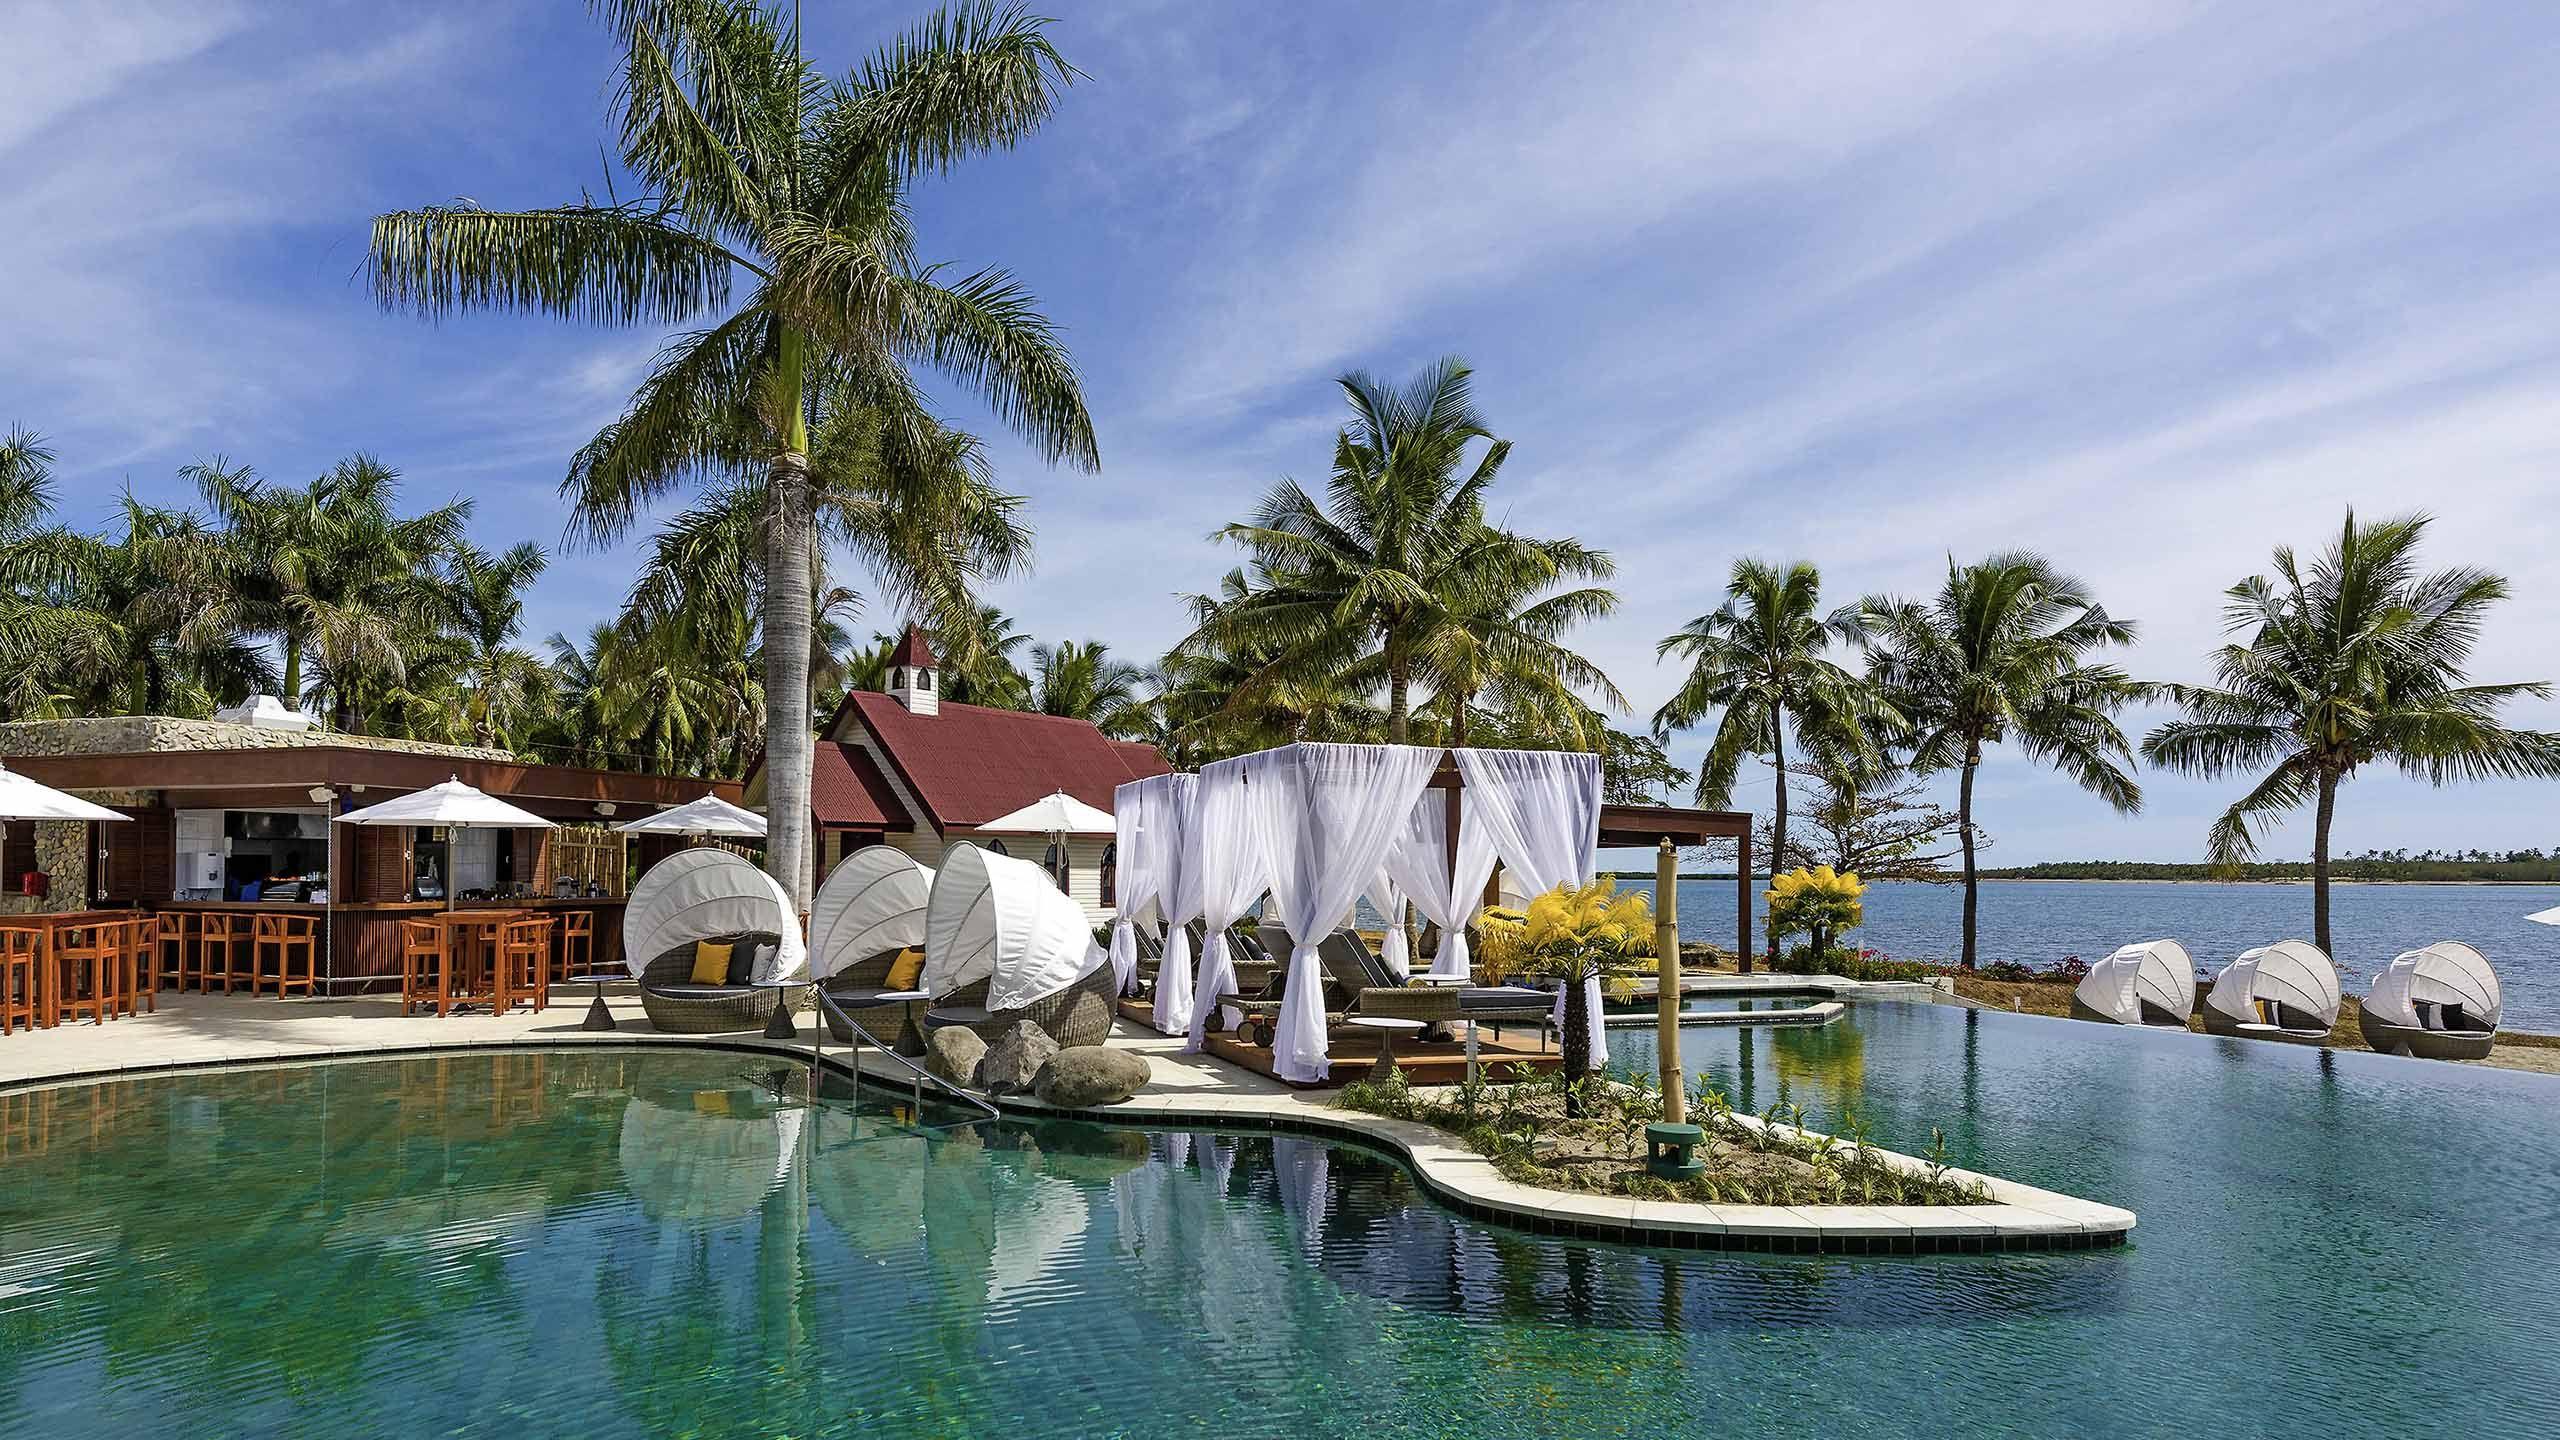 Sofitel Fiji Resort And Spa Is Located On Beautiful Denarau